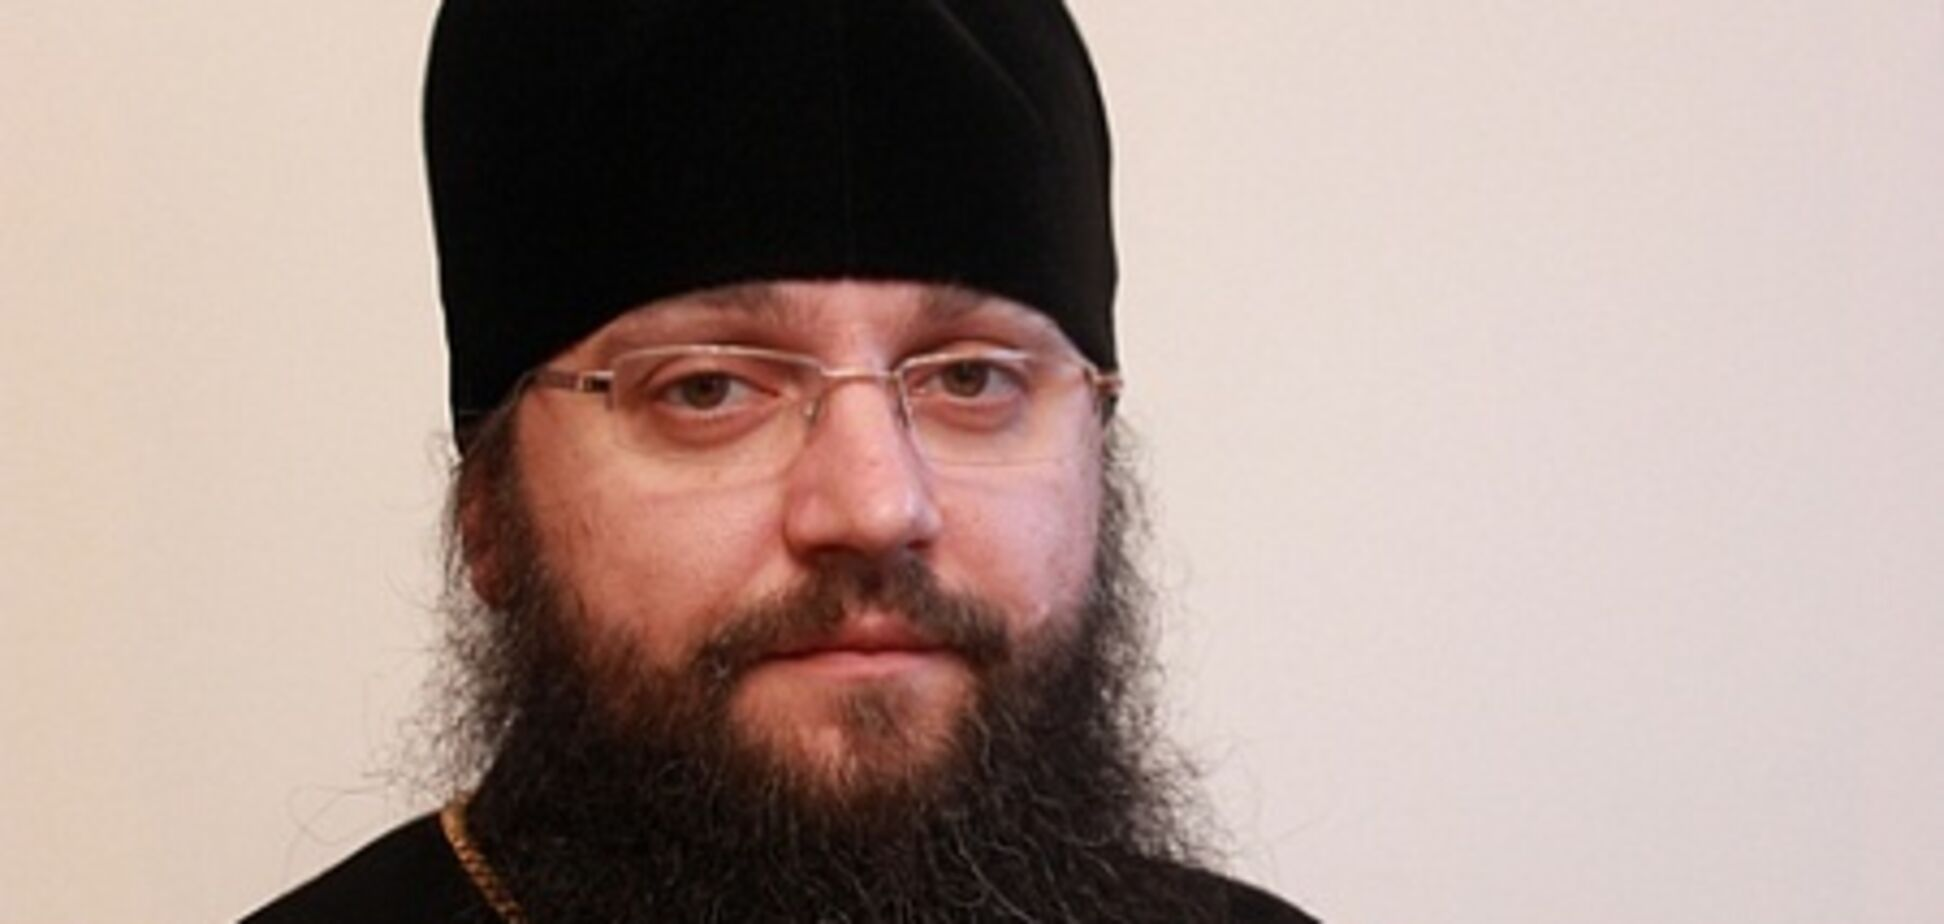 Московский патриархат отказался от участия в Соборе